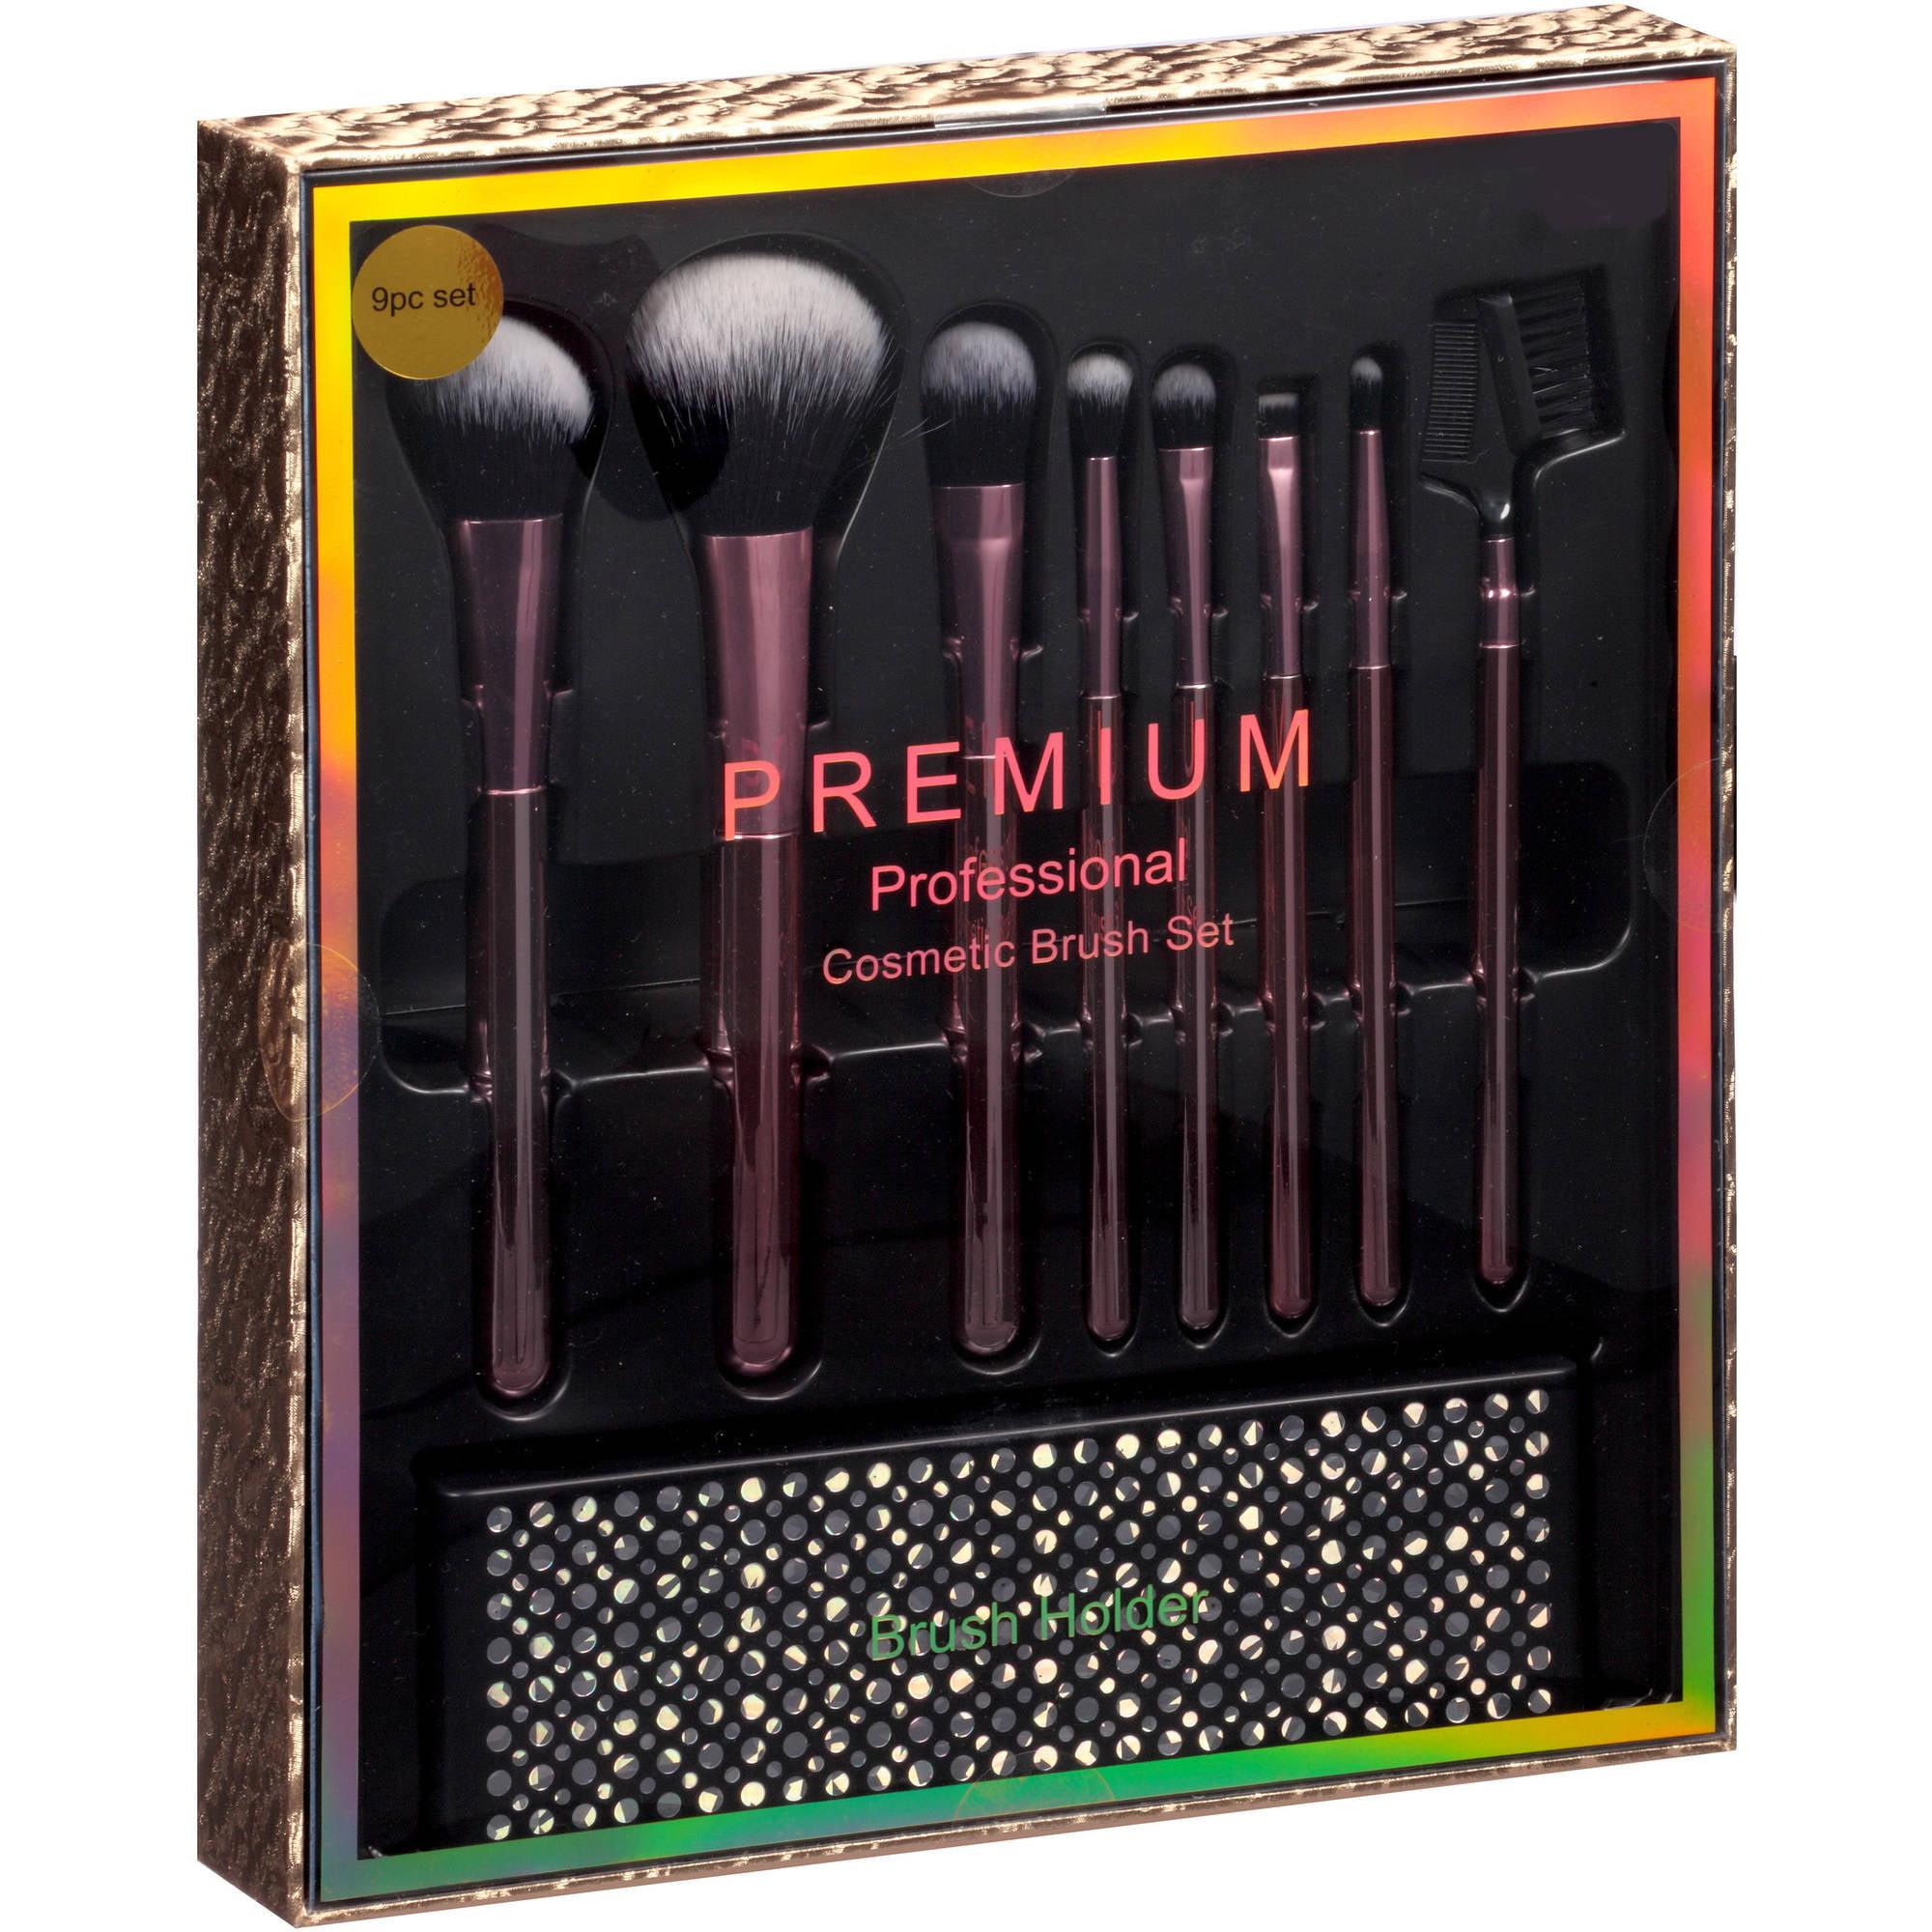 Professional Cosmetic Brush Gift Set, 9 pc - Walmart.com